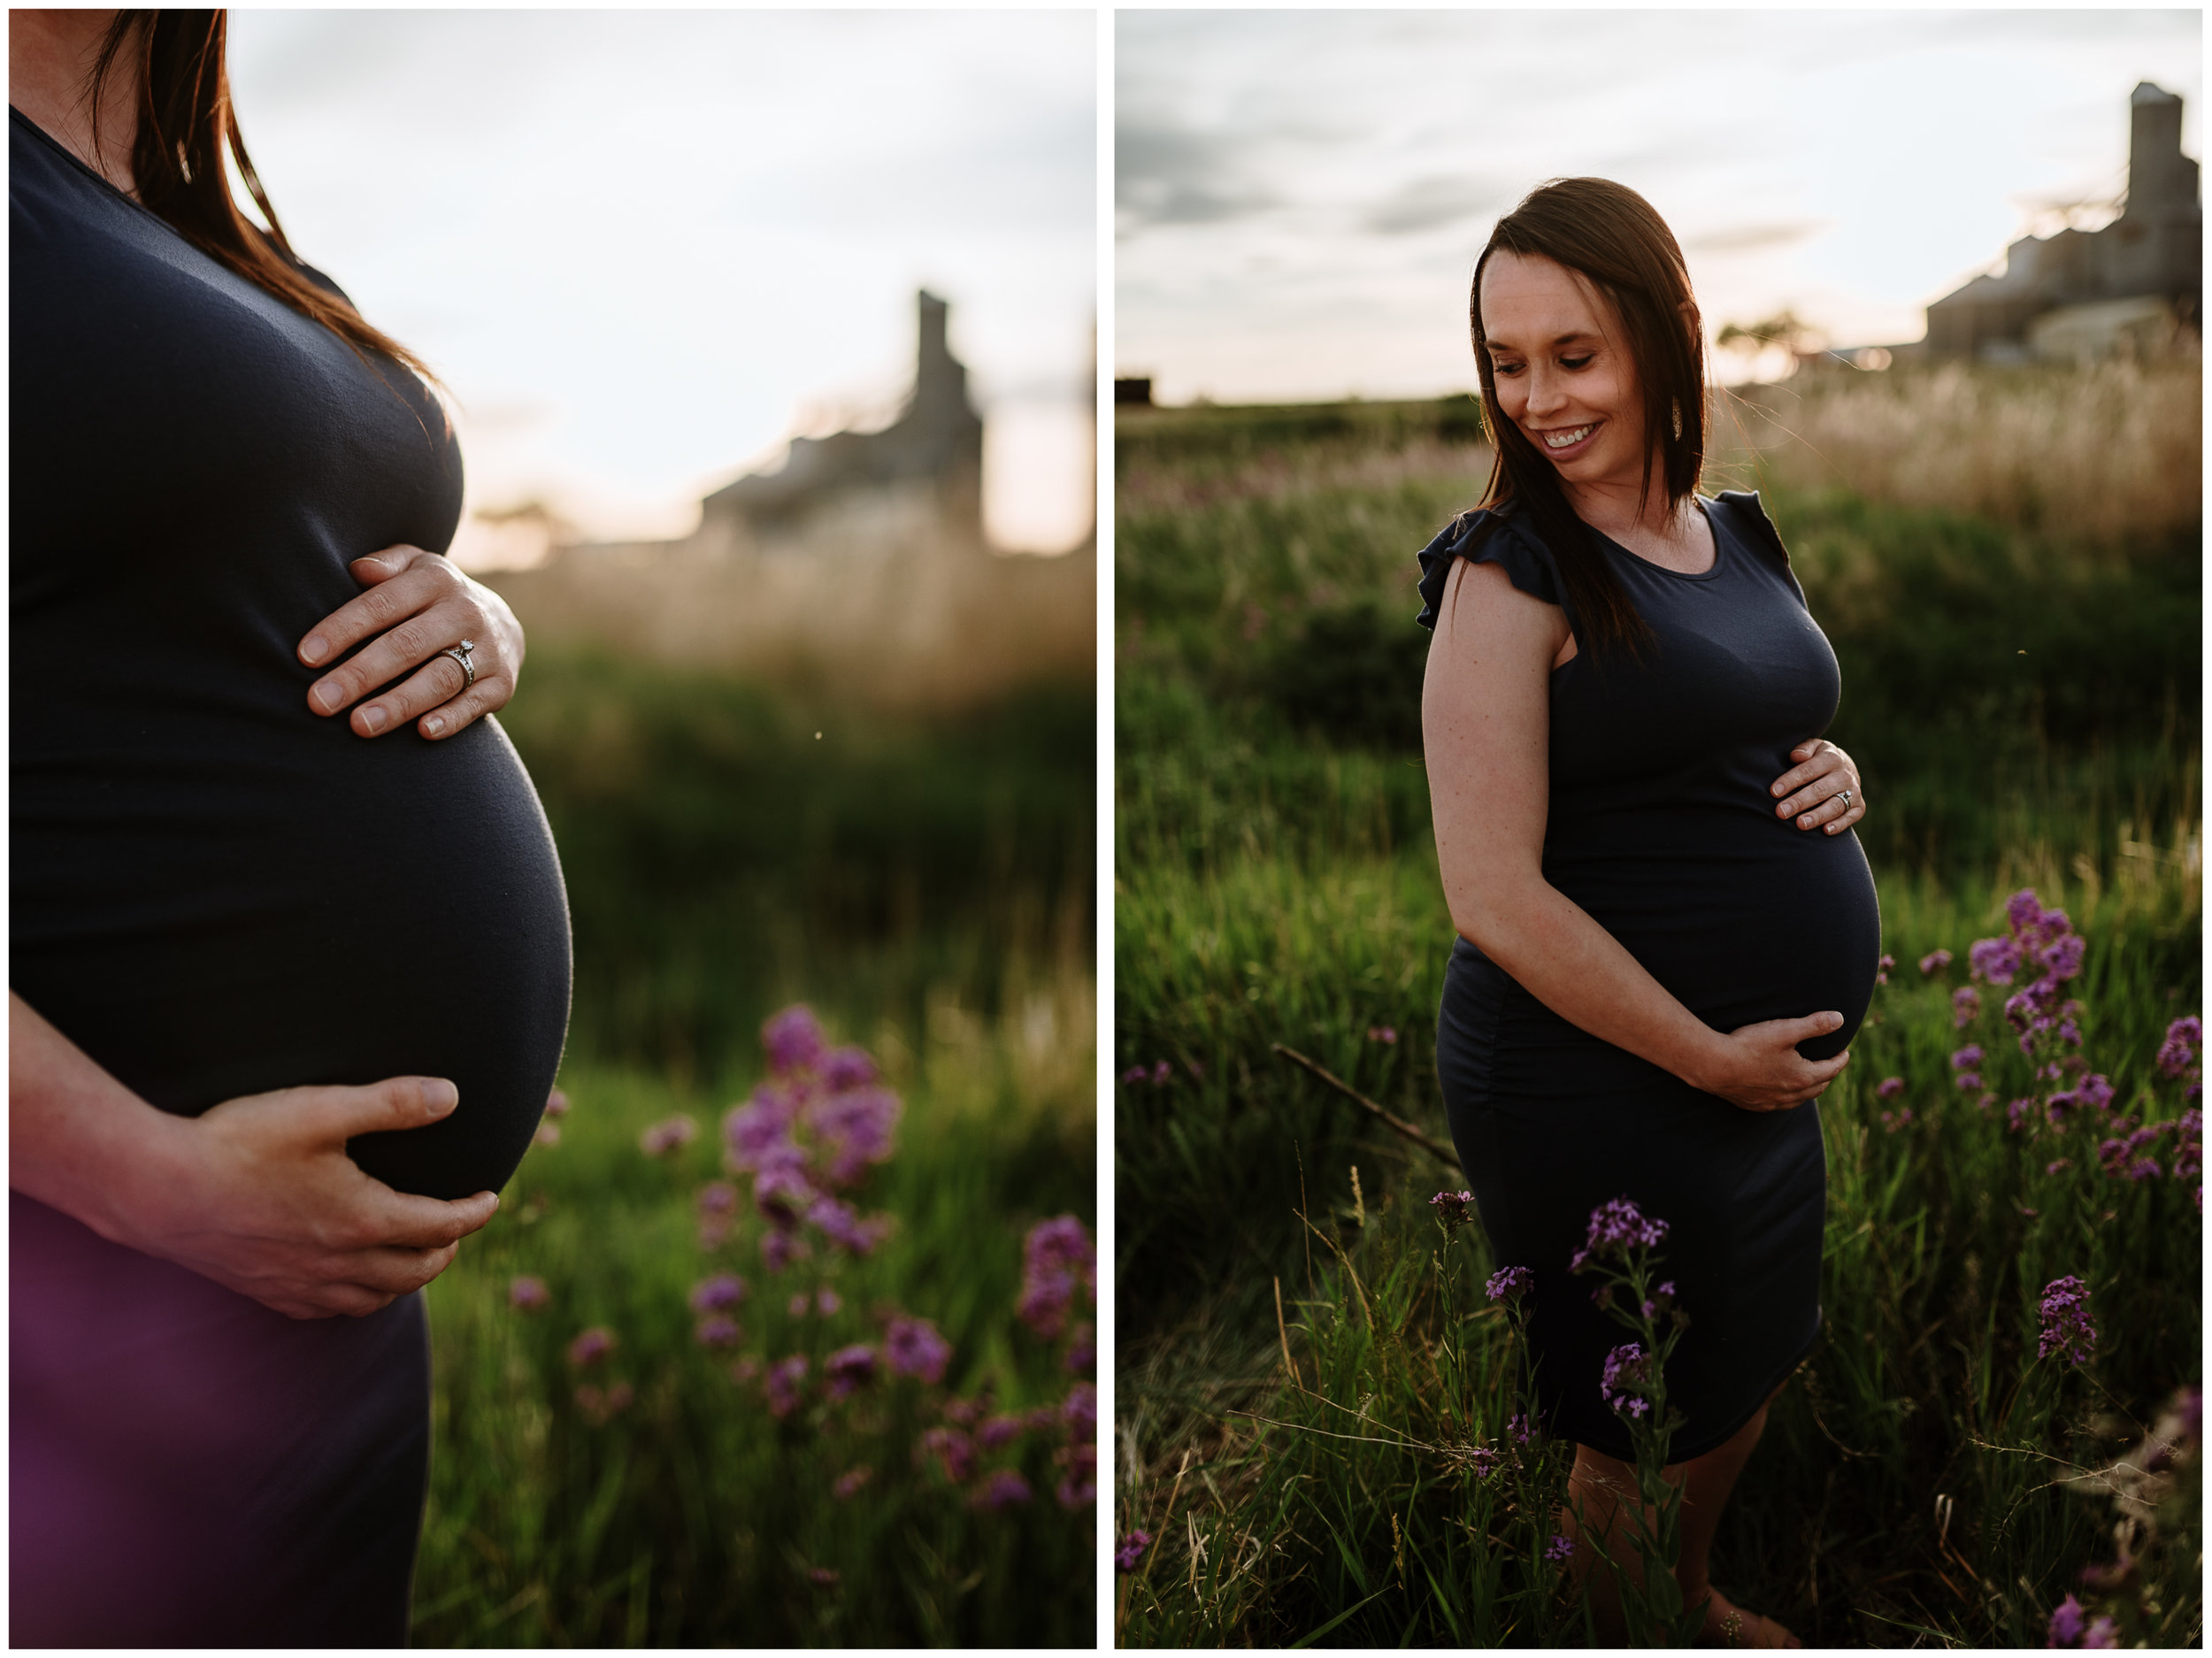 kayla_maternity_web.jpg